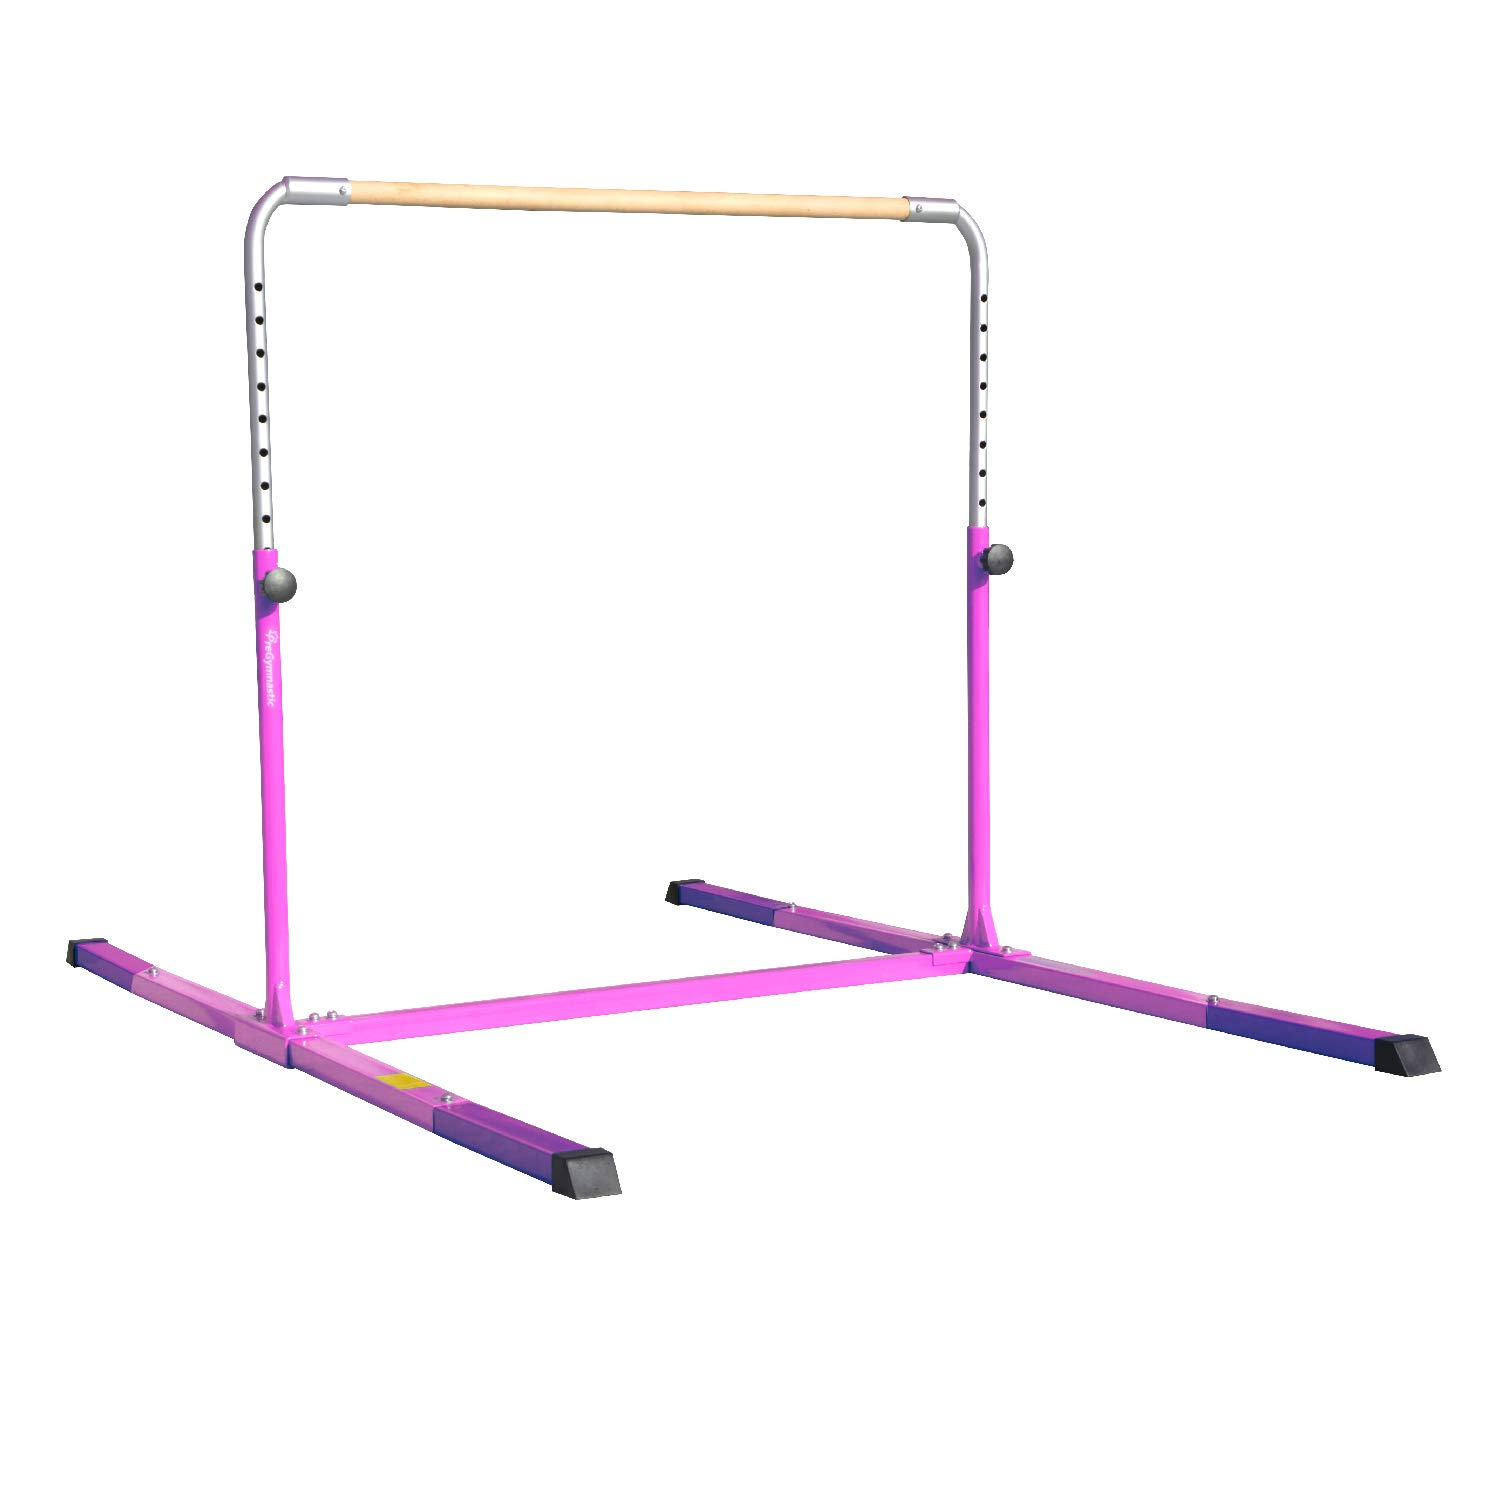 PreGymnastic Gymnastics Extension Kits//Extensions for Junior Training bar and Kip Bars